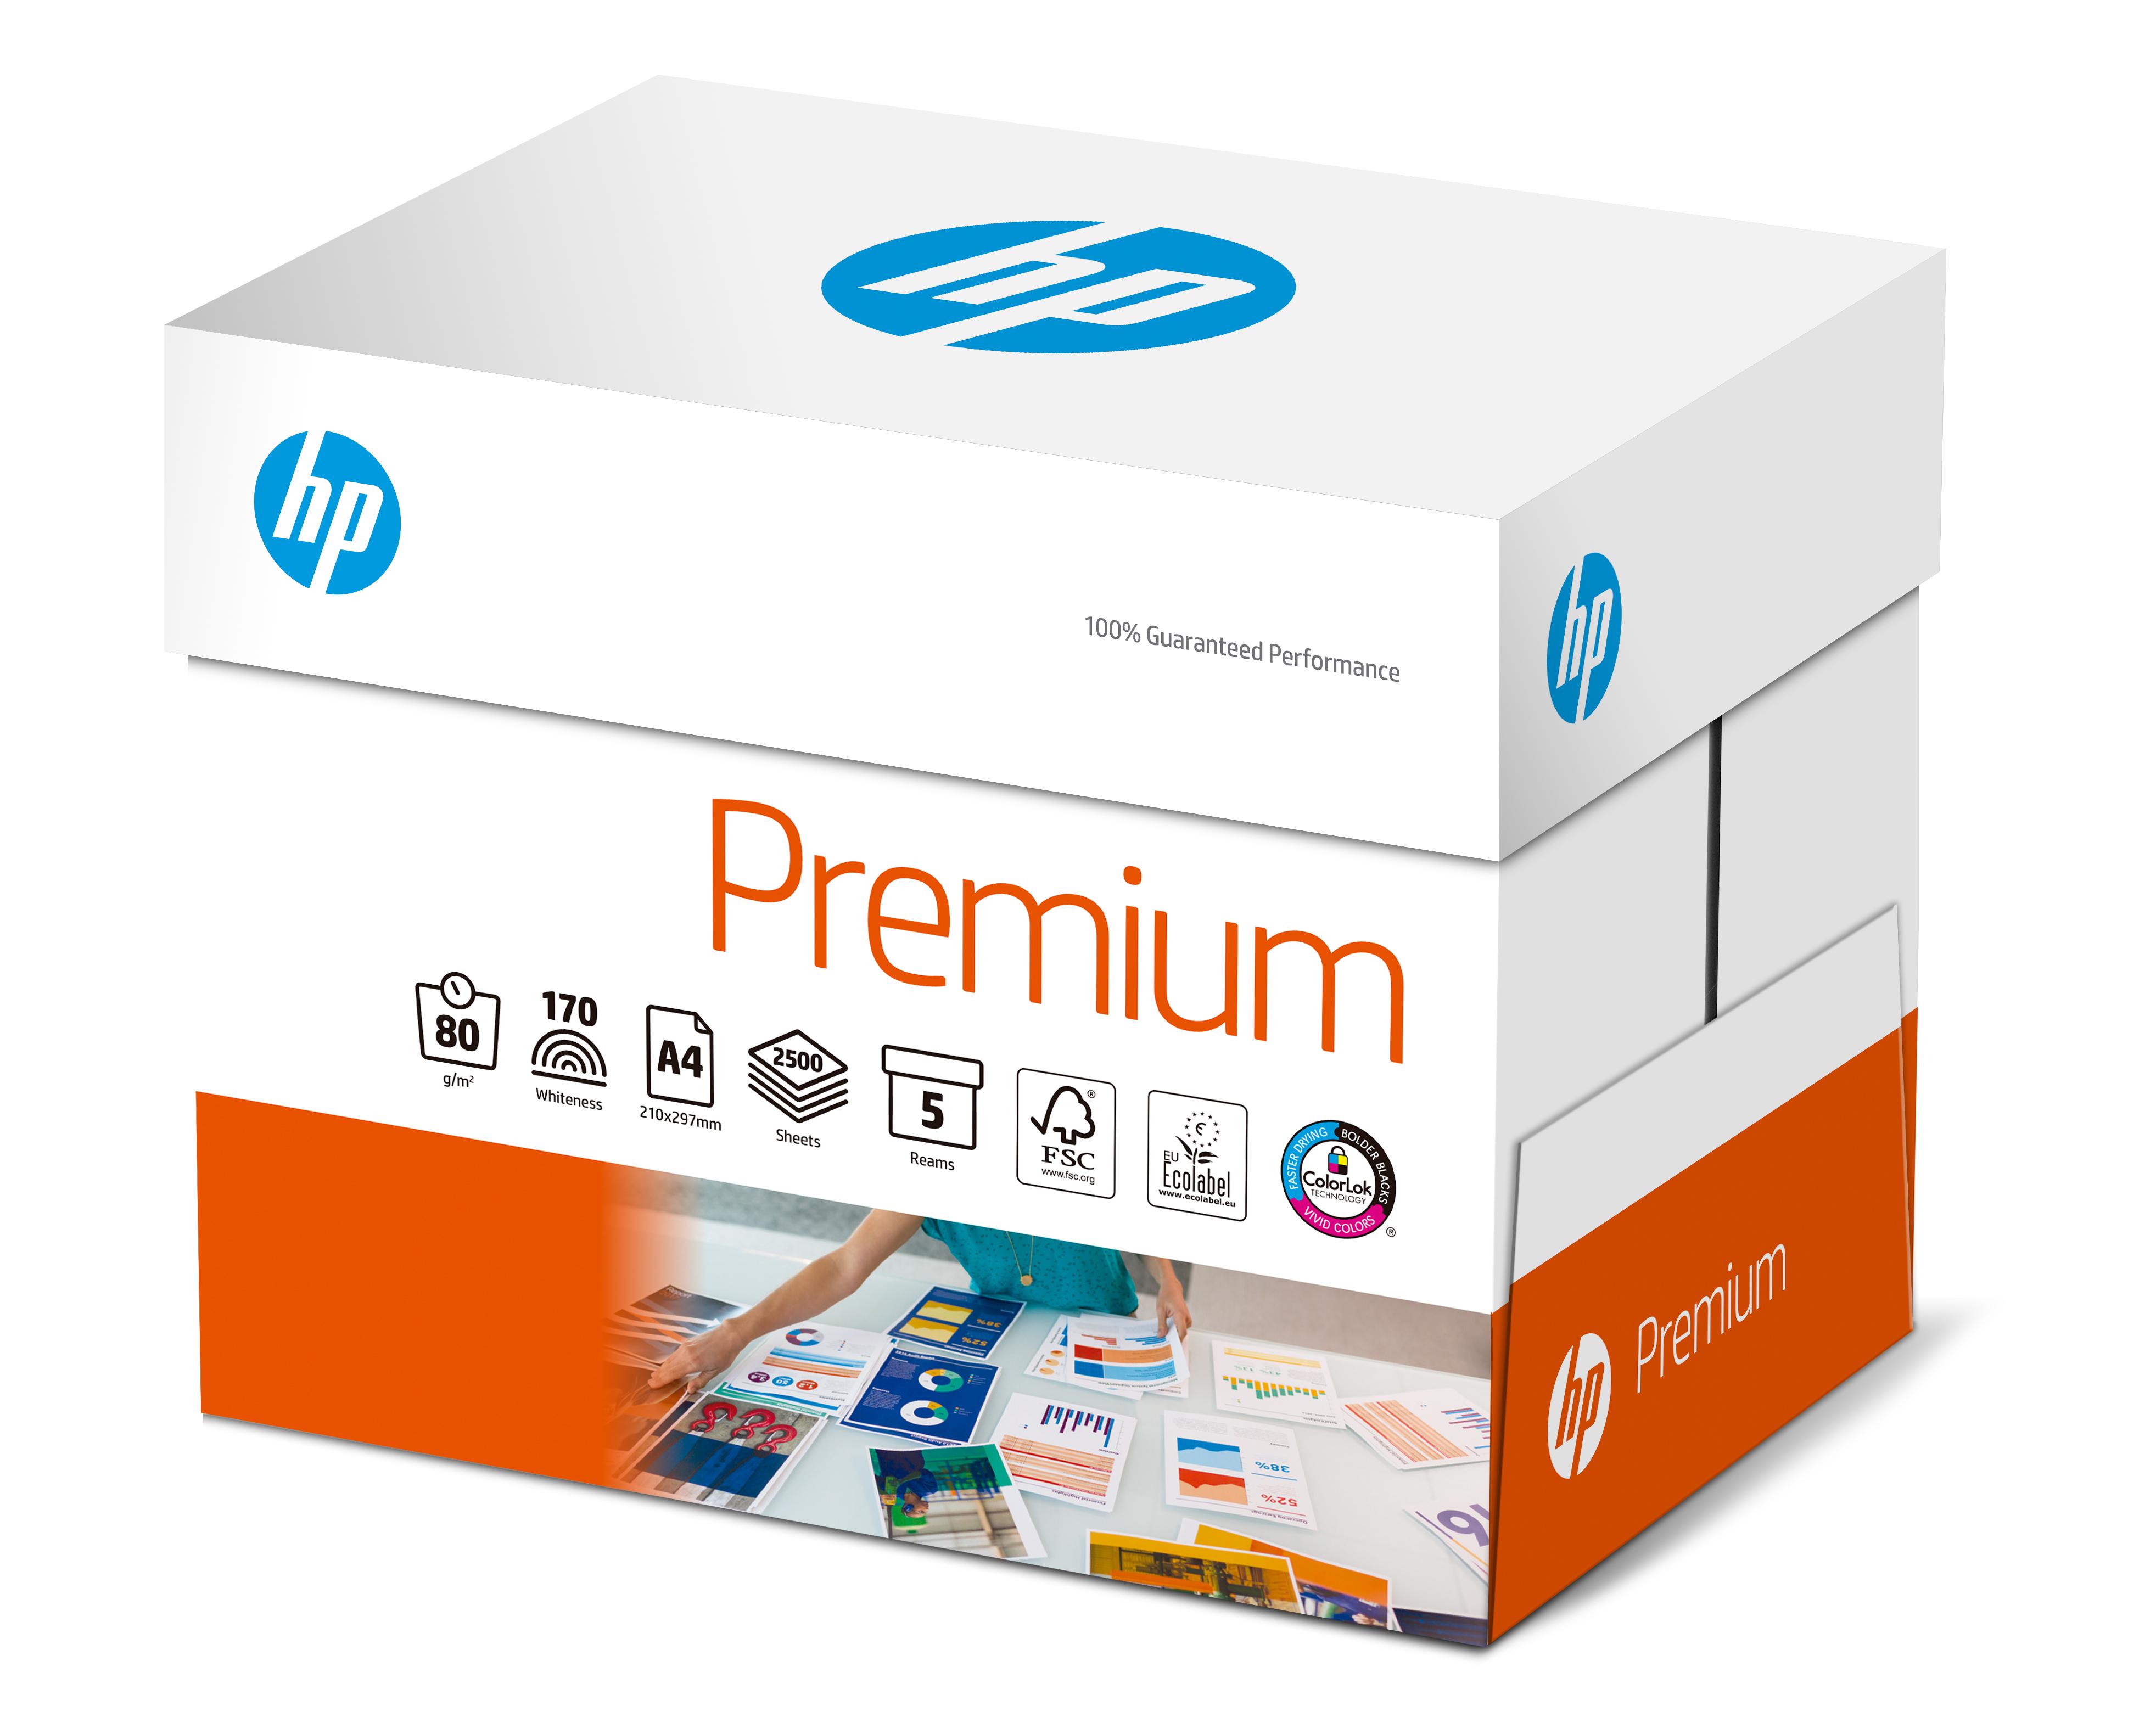 5000 Blatt HP Premium ( früher Printing InkJet CHP210) Papier CHP850 80g/m² DIN-A4